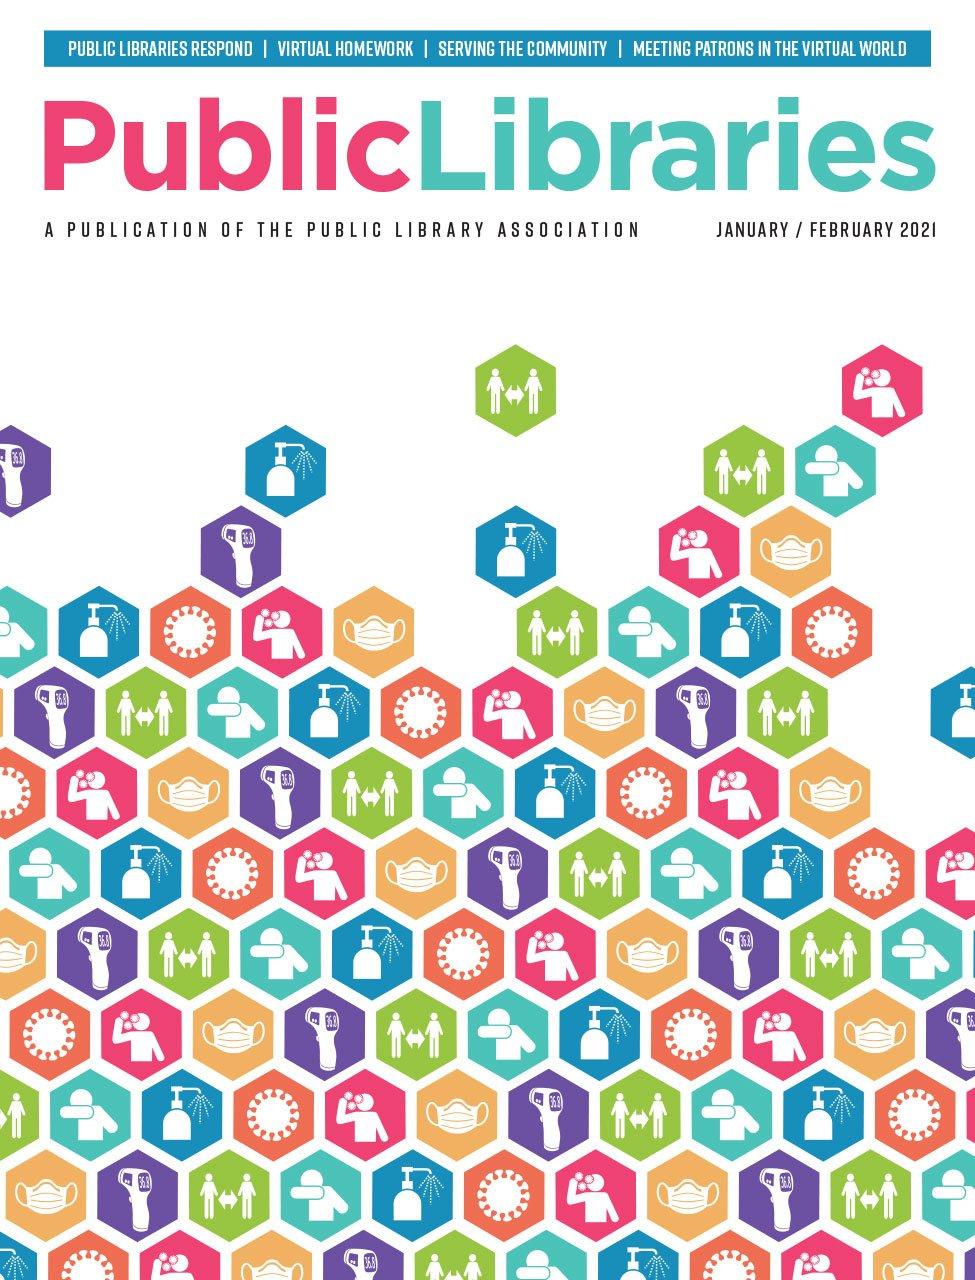 Public Libraries Magazine cover, Jan/Feb 2021 issue